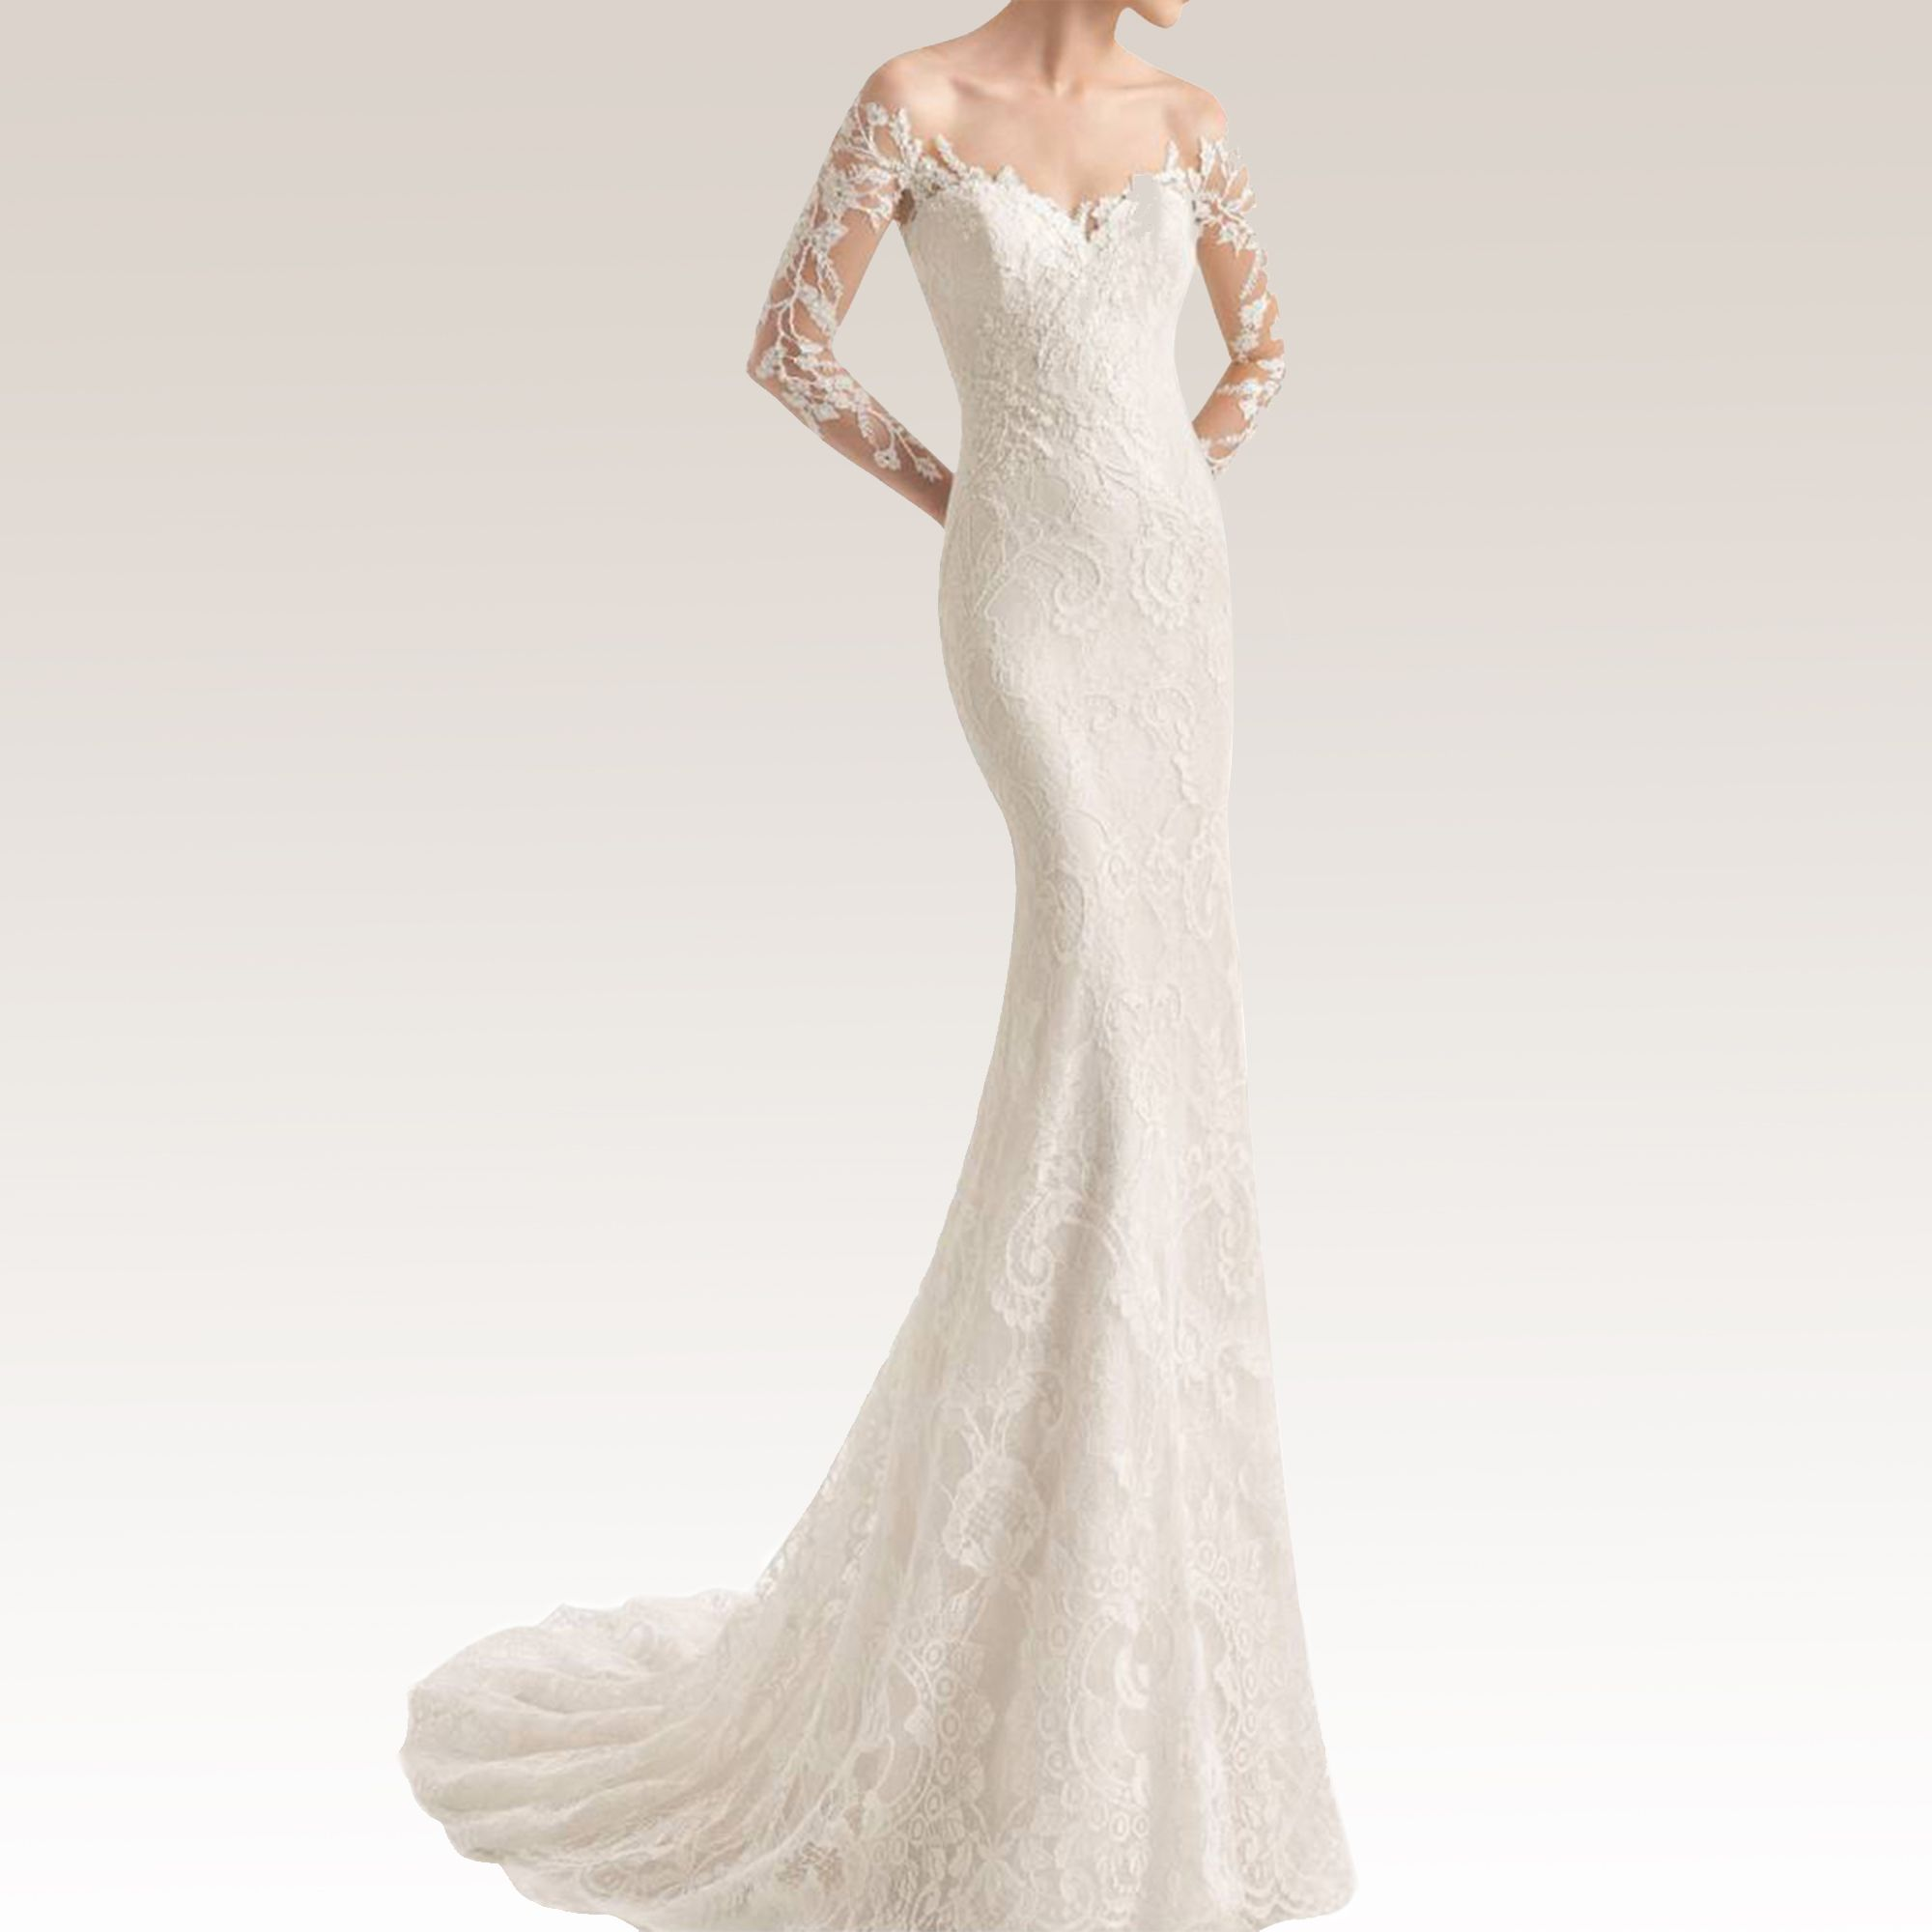 Petite Wedding Dresses Top 5 Choices For Short Brides Wedding Dress For Short Women Wedding Dresses For Petite Women Petite Wedding Dress Short [ 1400 x 735 Pixel ]